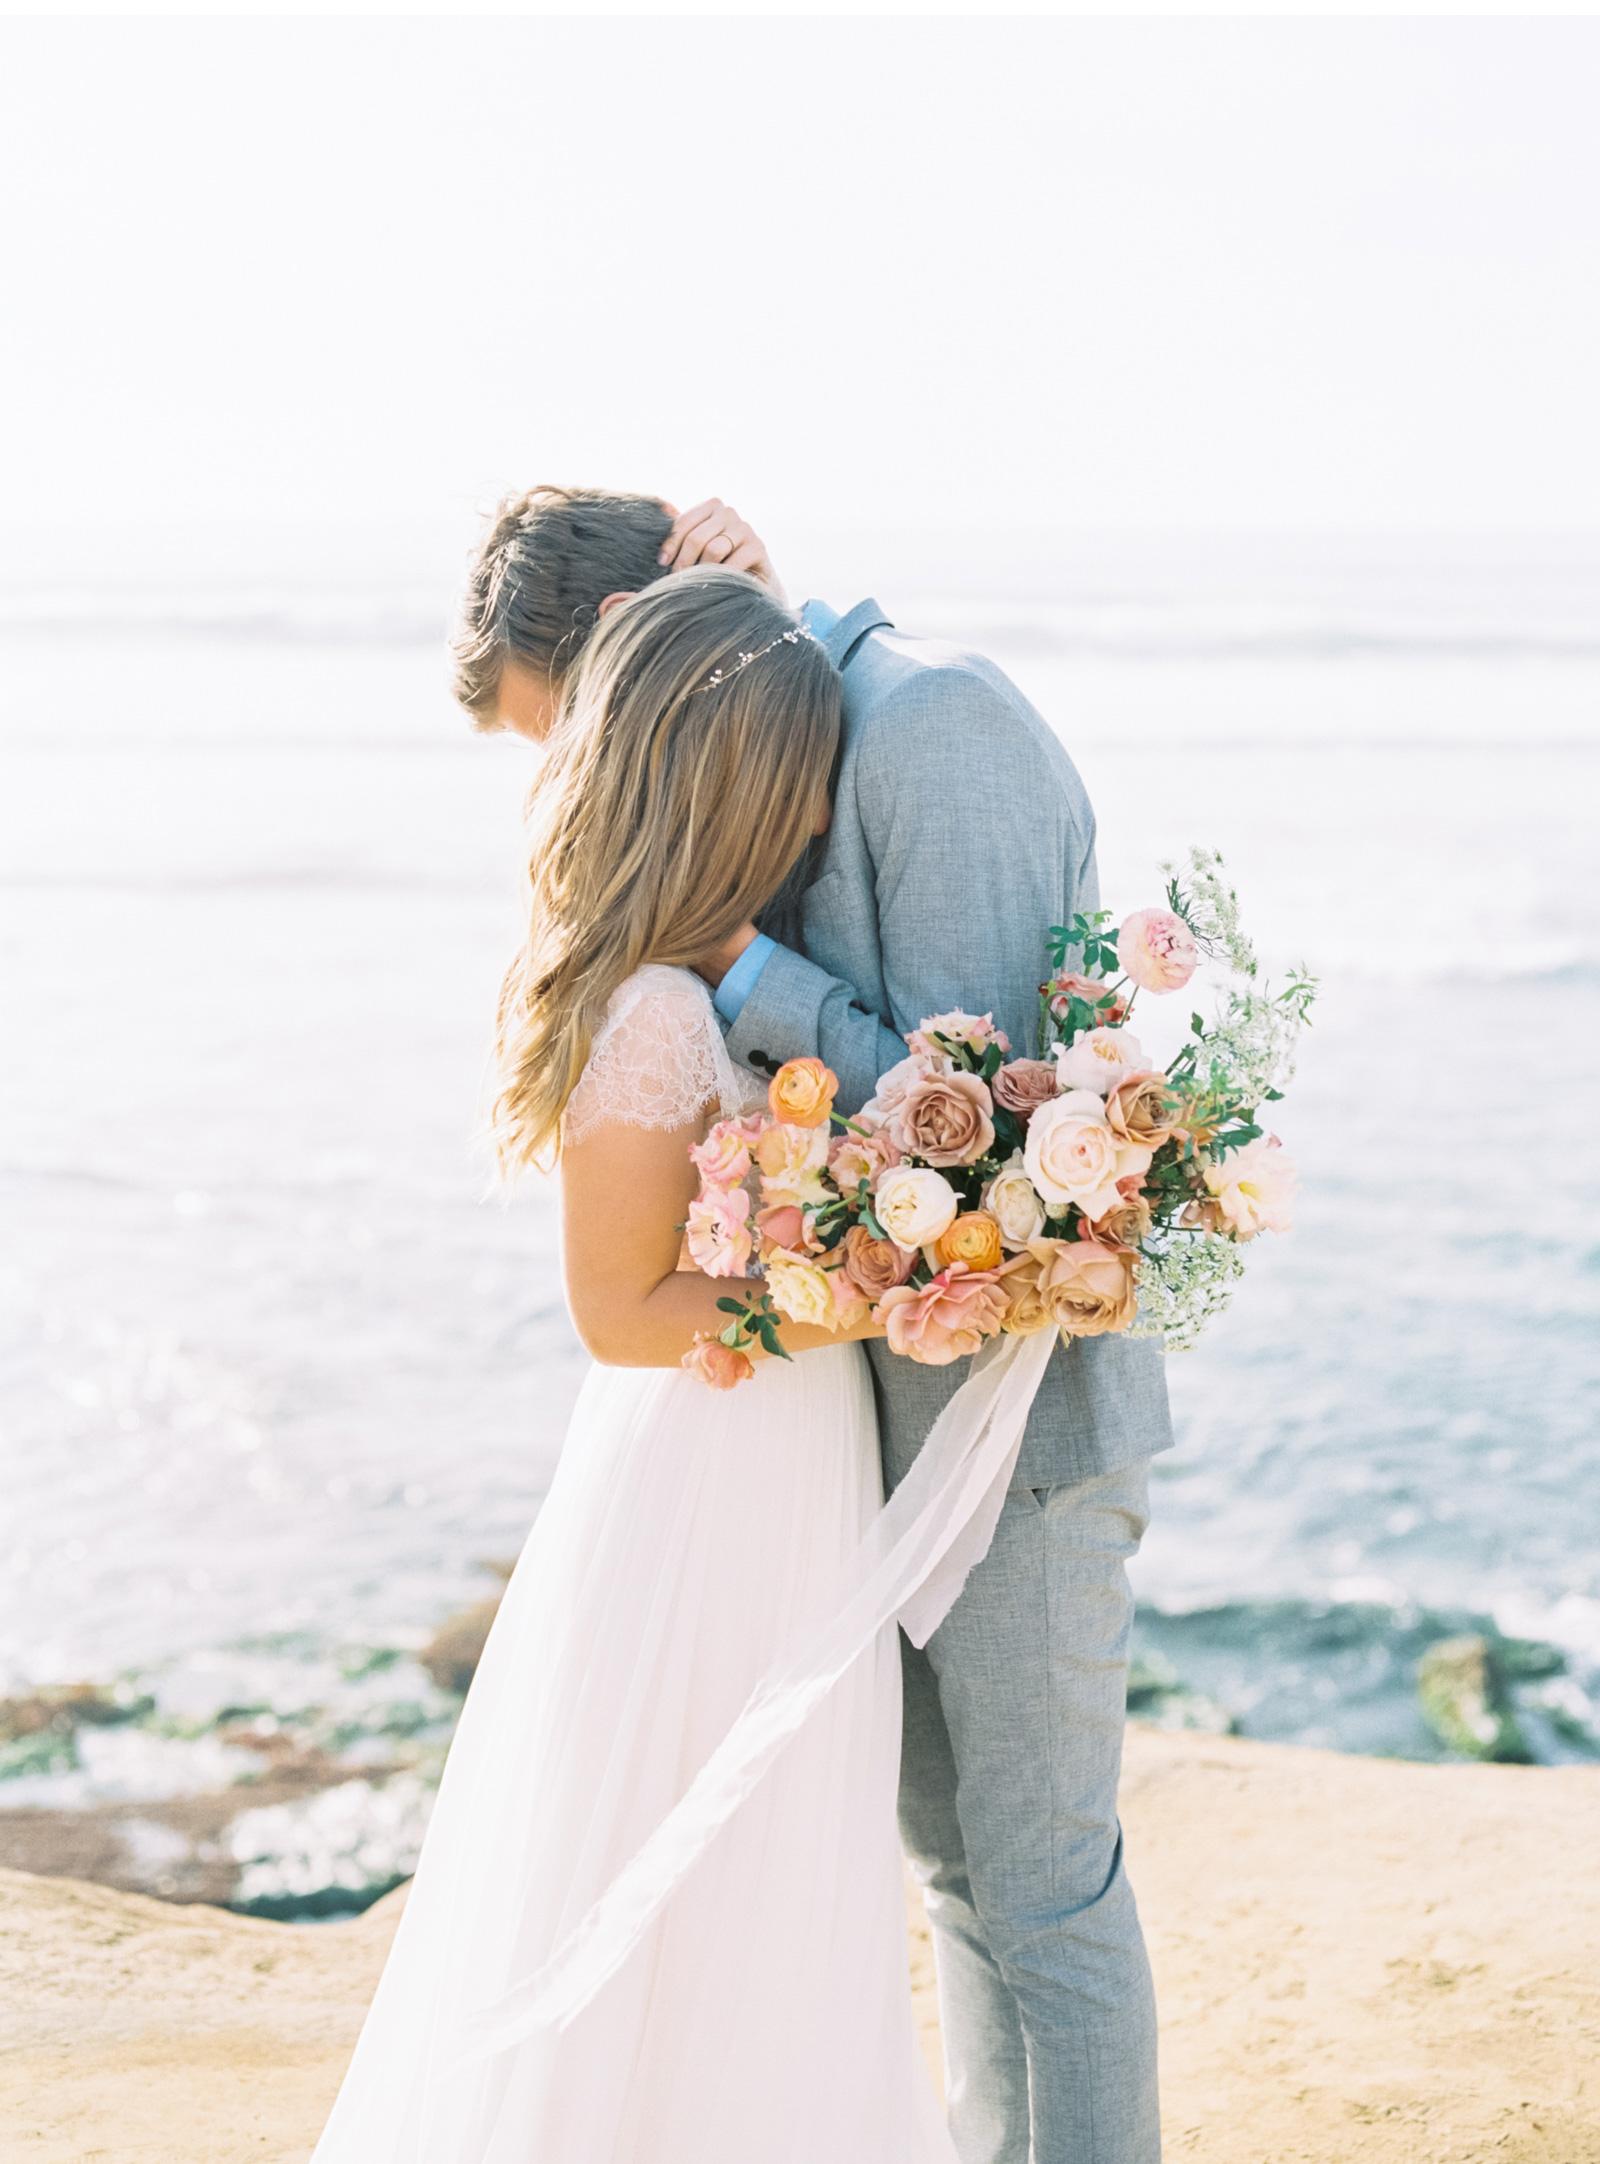 Style-Me-Pretty-California-Beach-Wedding-Natalie-Schutt-Photography_06.jpg